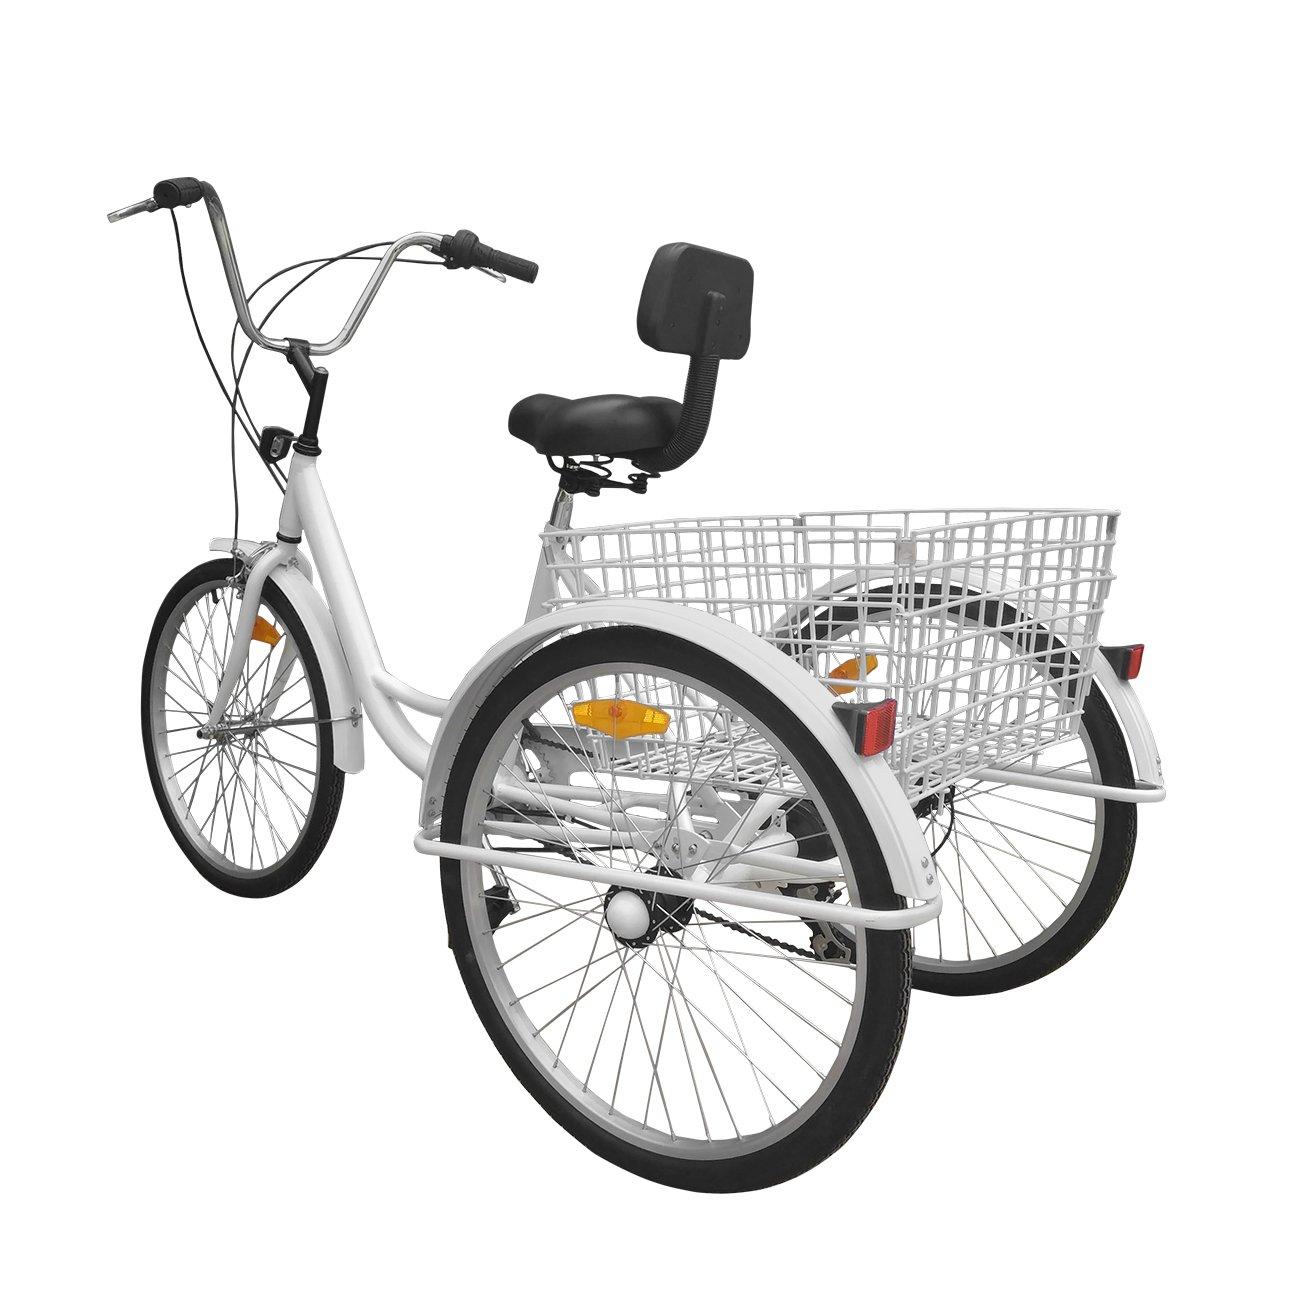 Bici a 3 ruote Urban Paneltech per adulti 6 velocitàe cestino02